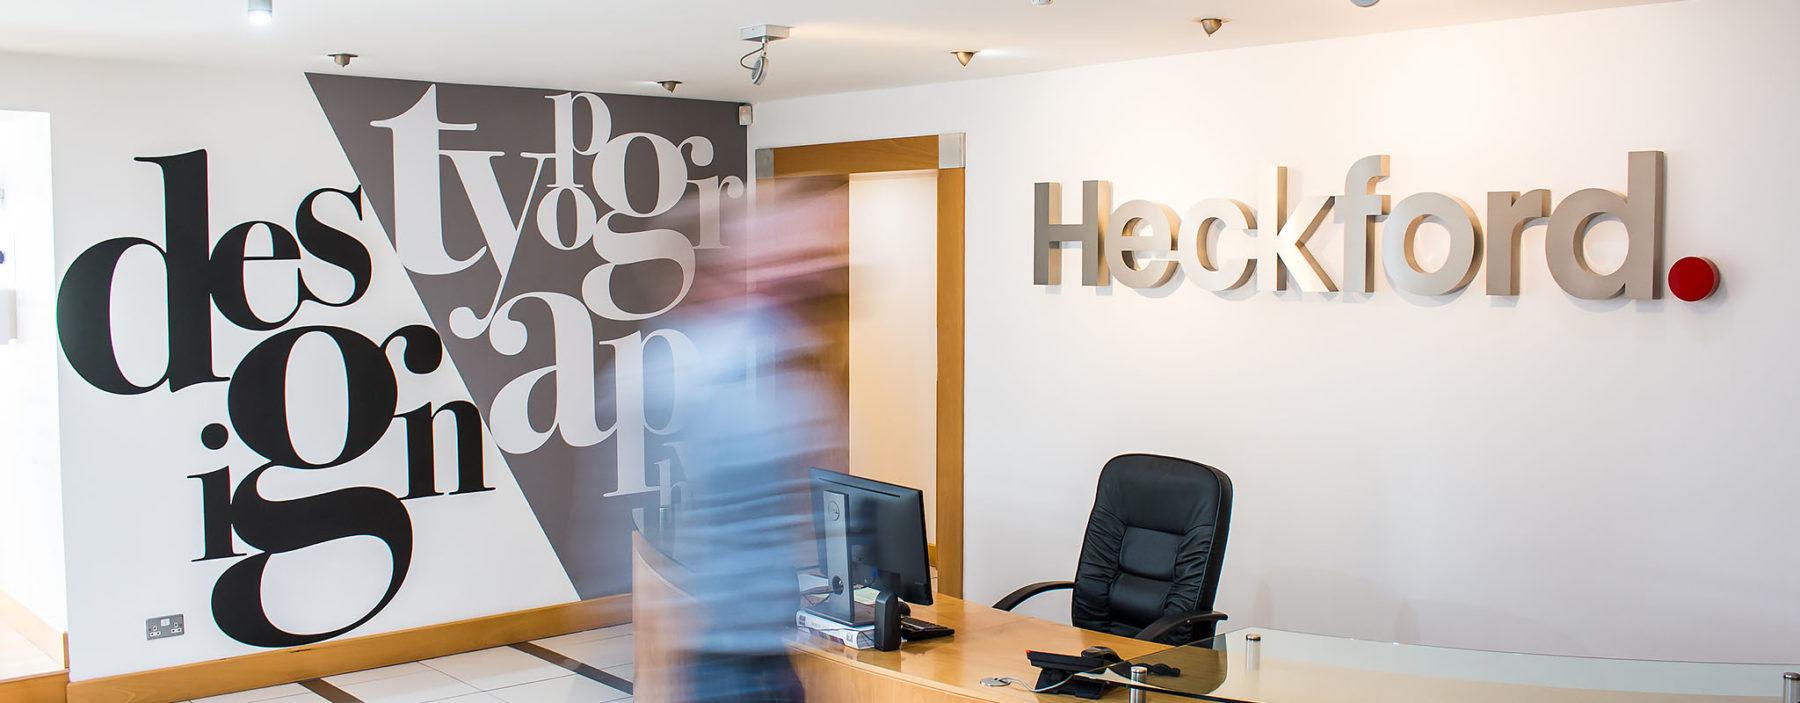 Multi-disciplined marketing agency reception area